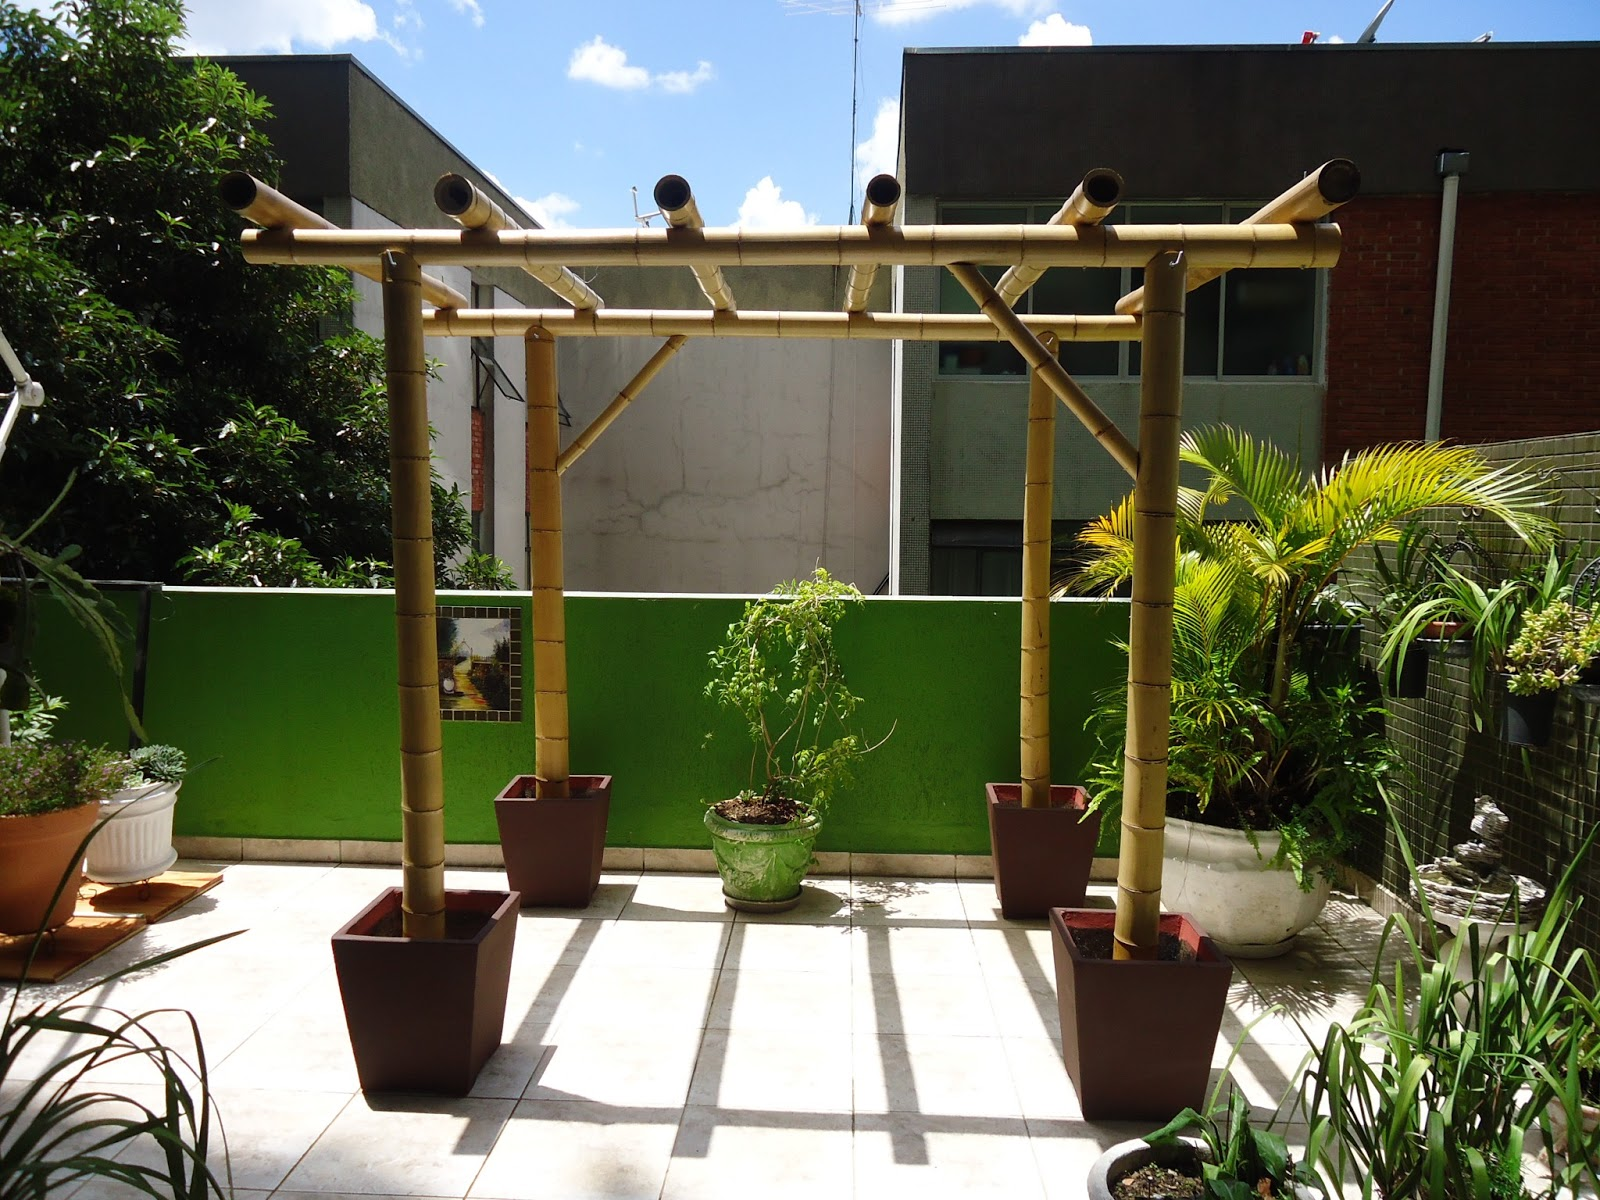 jardim vertical bambu:domingo, 14 de abril de 2013